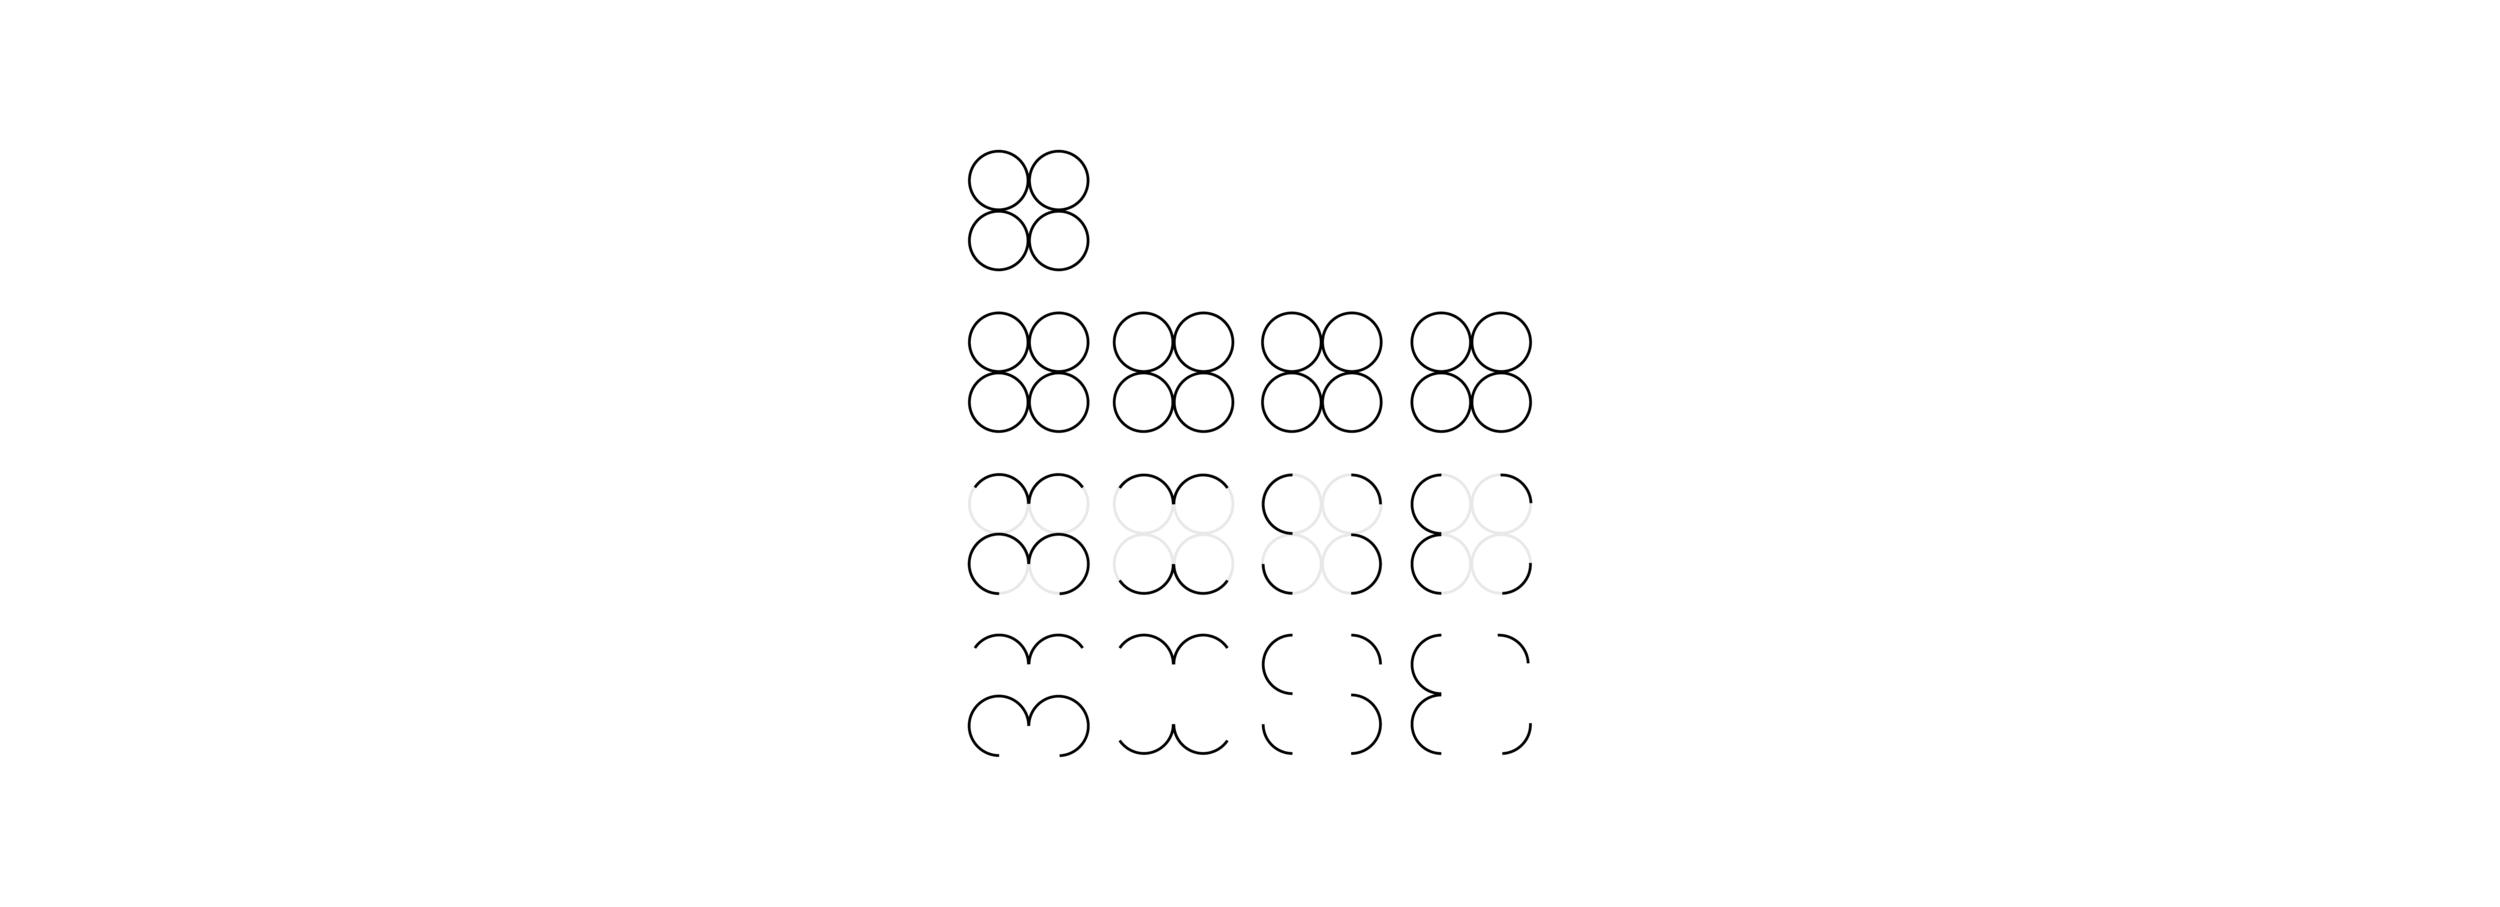 conceptexplanation-16.png